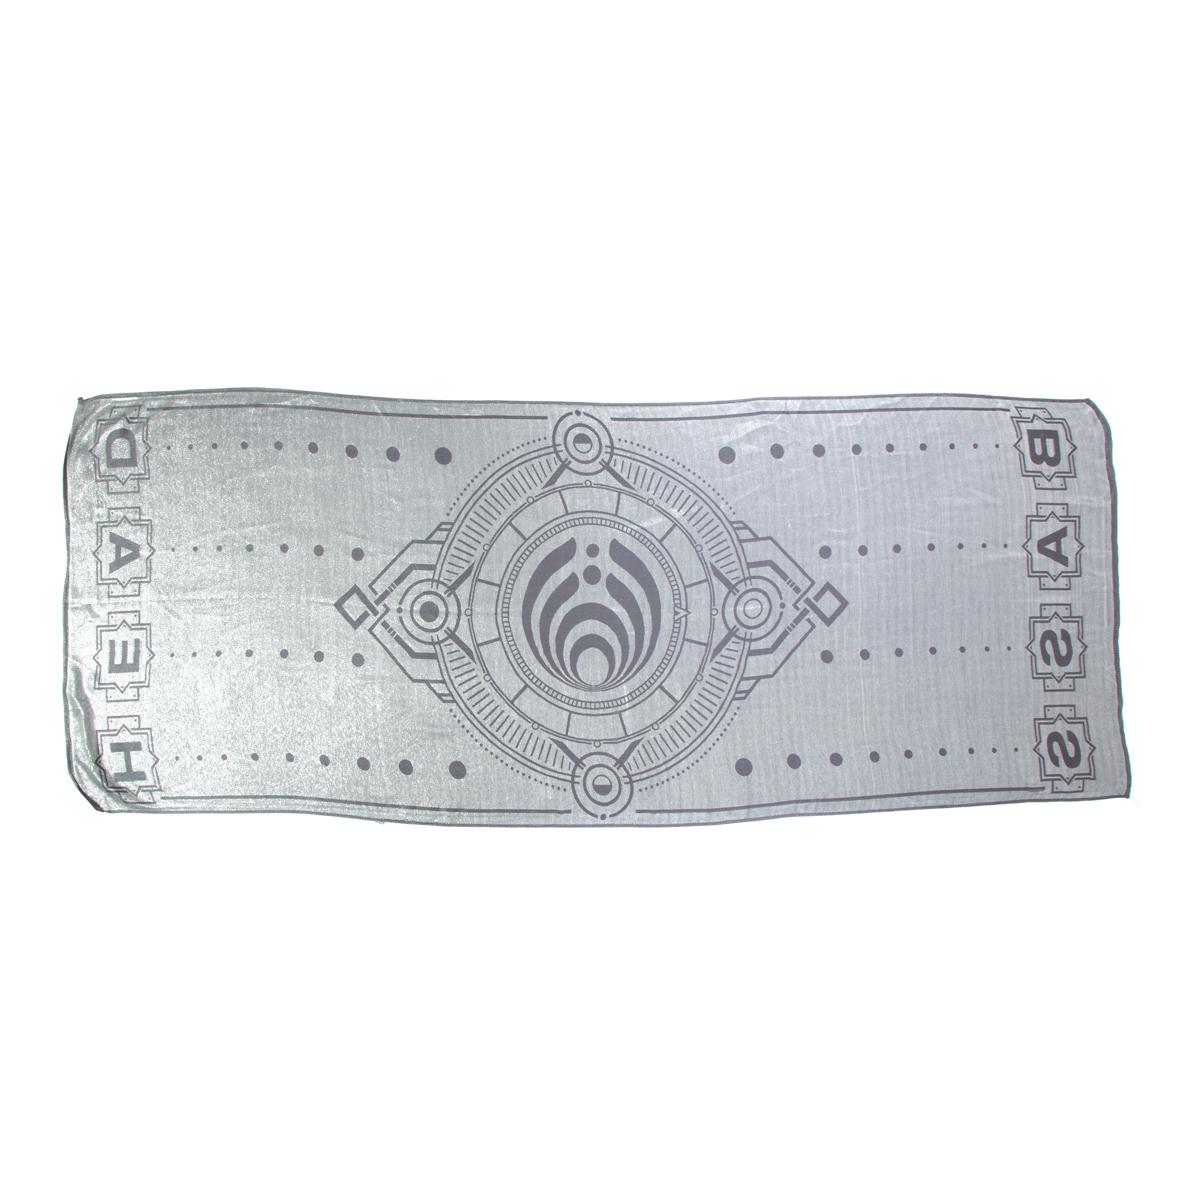 Bass Dharma Pashmina - Silver